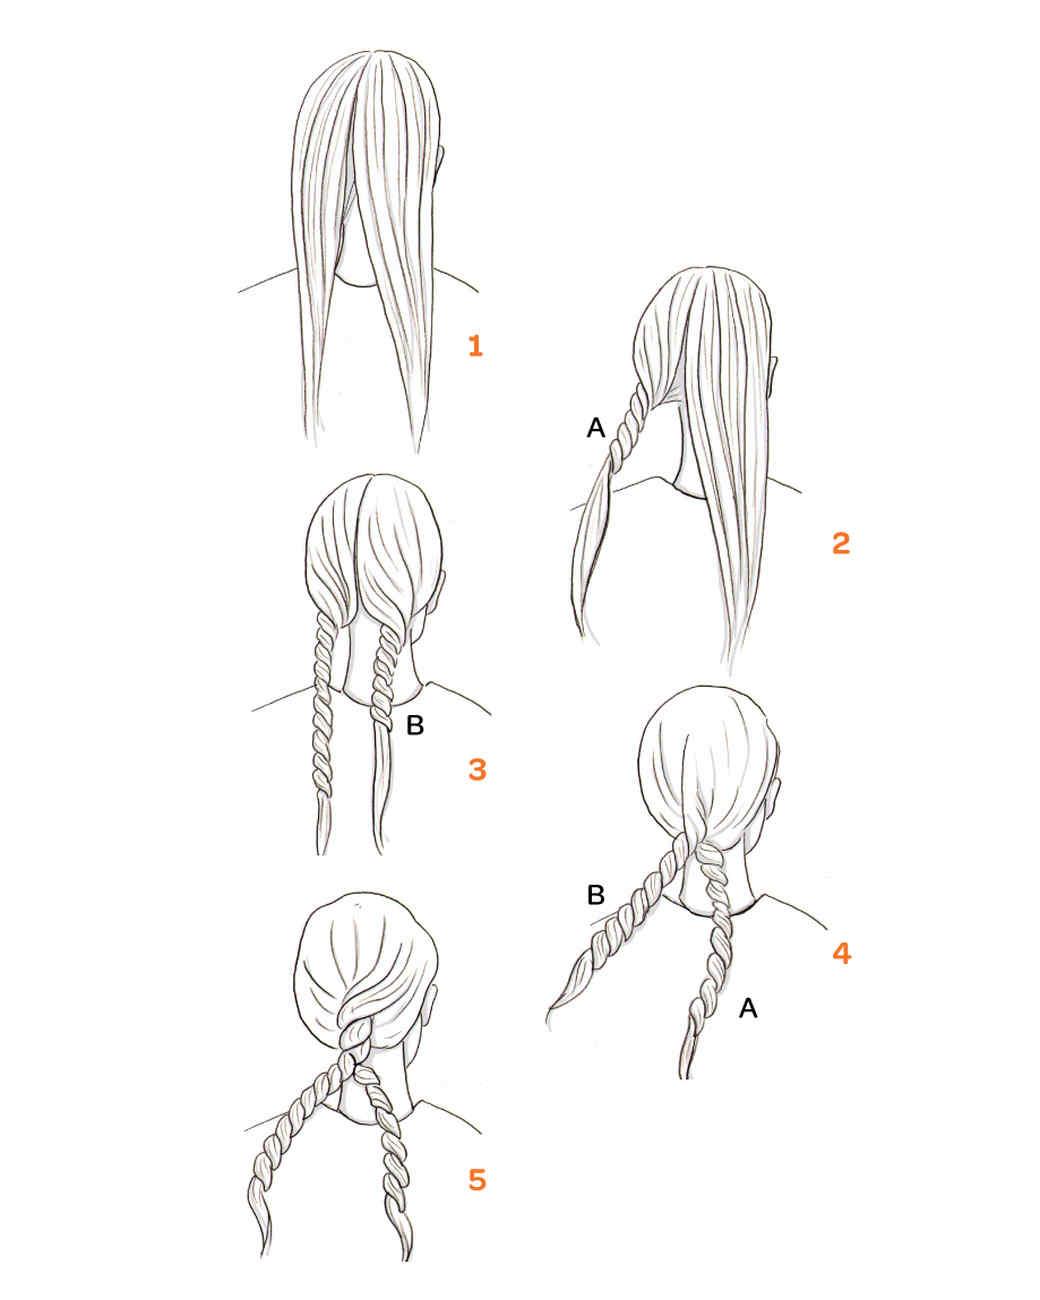 braids-rope-braid-illustration-mi108987.jpg